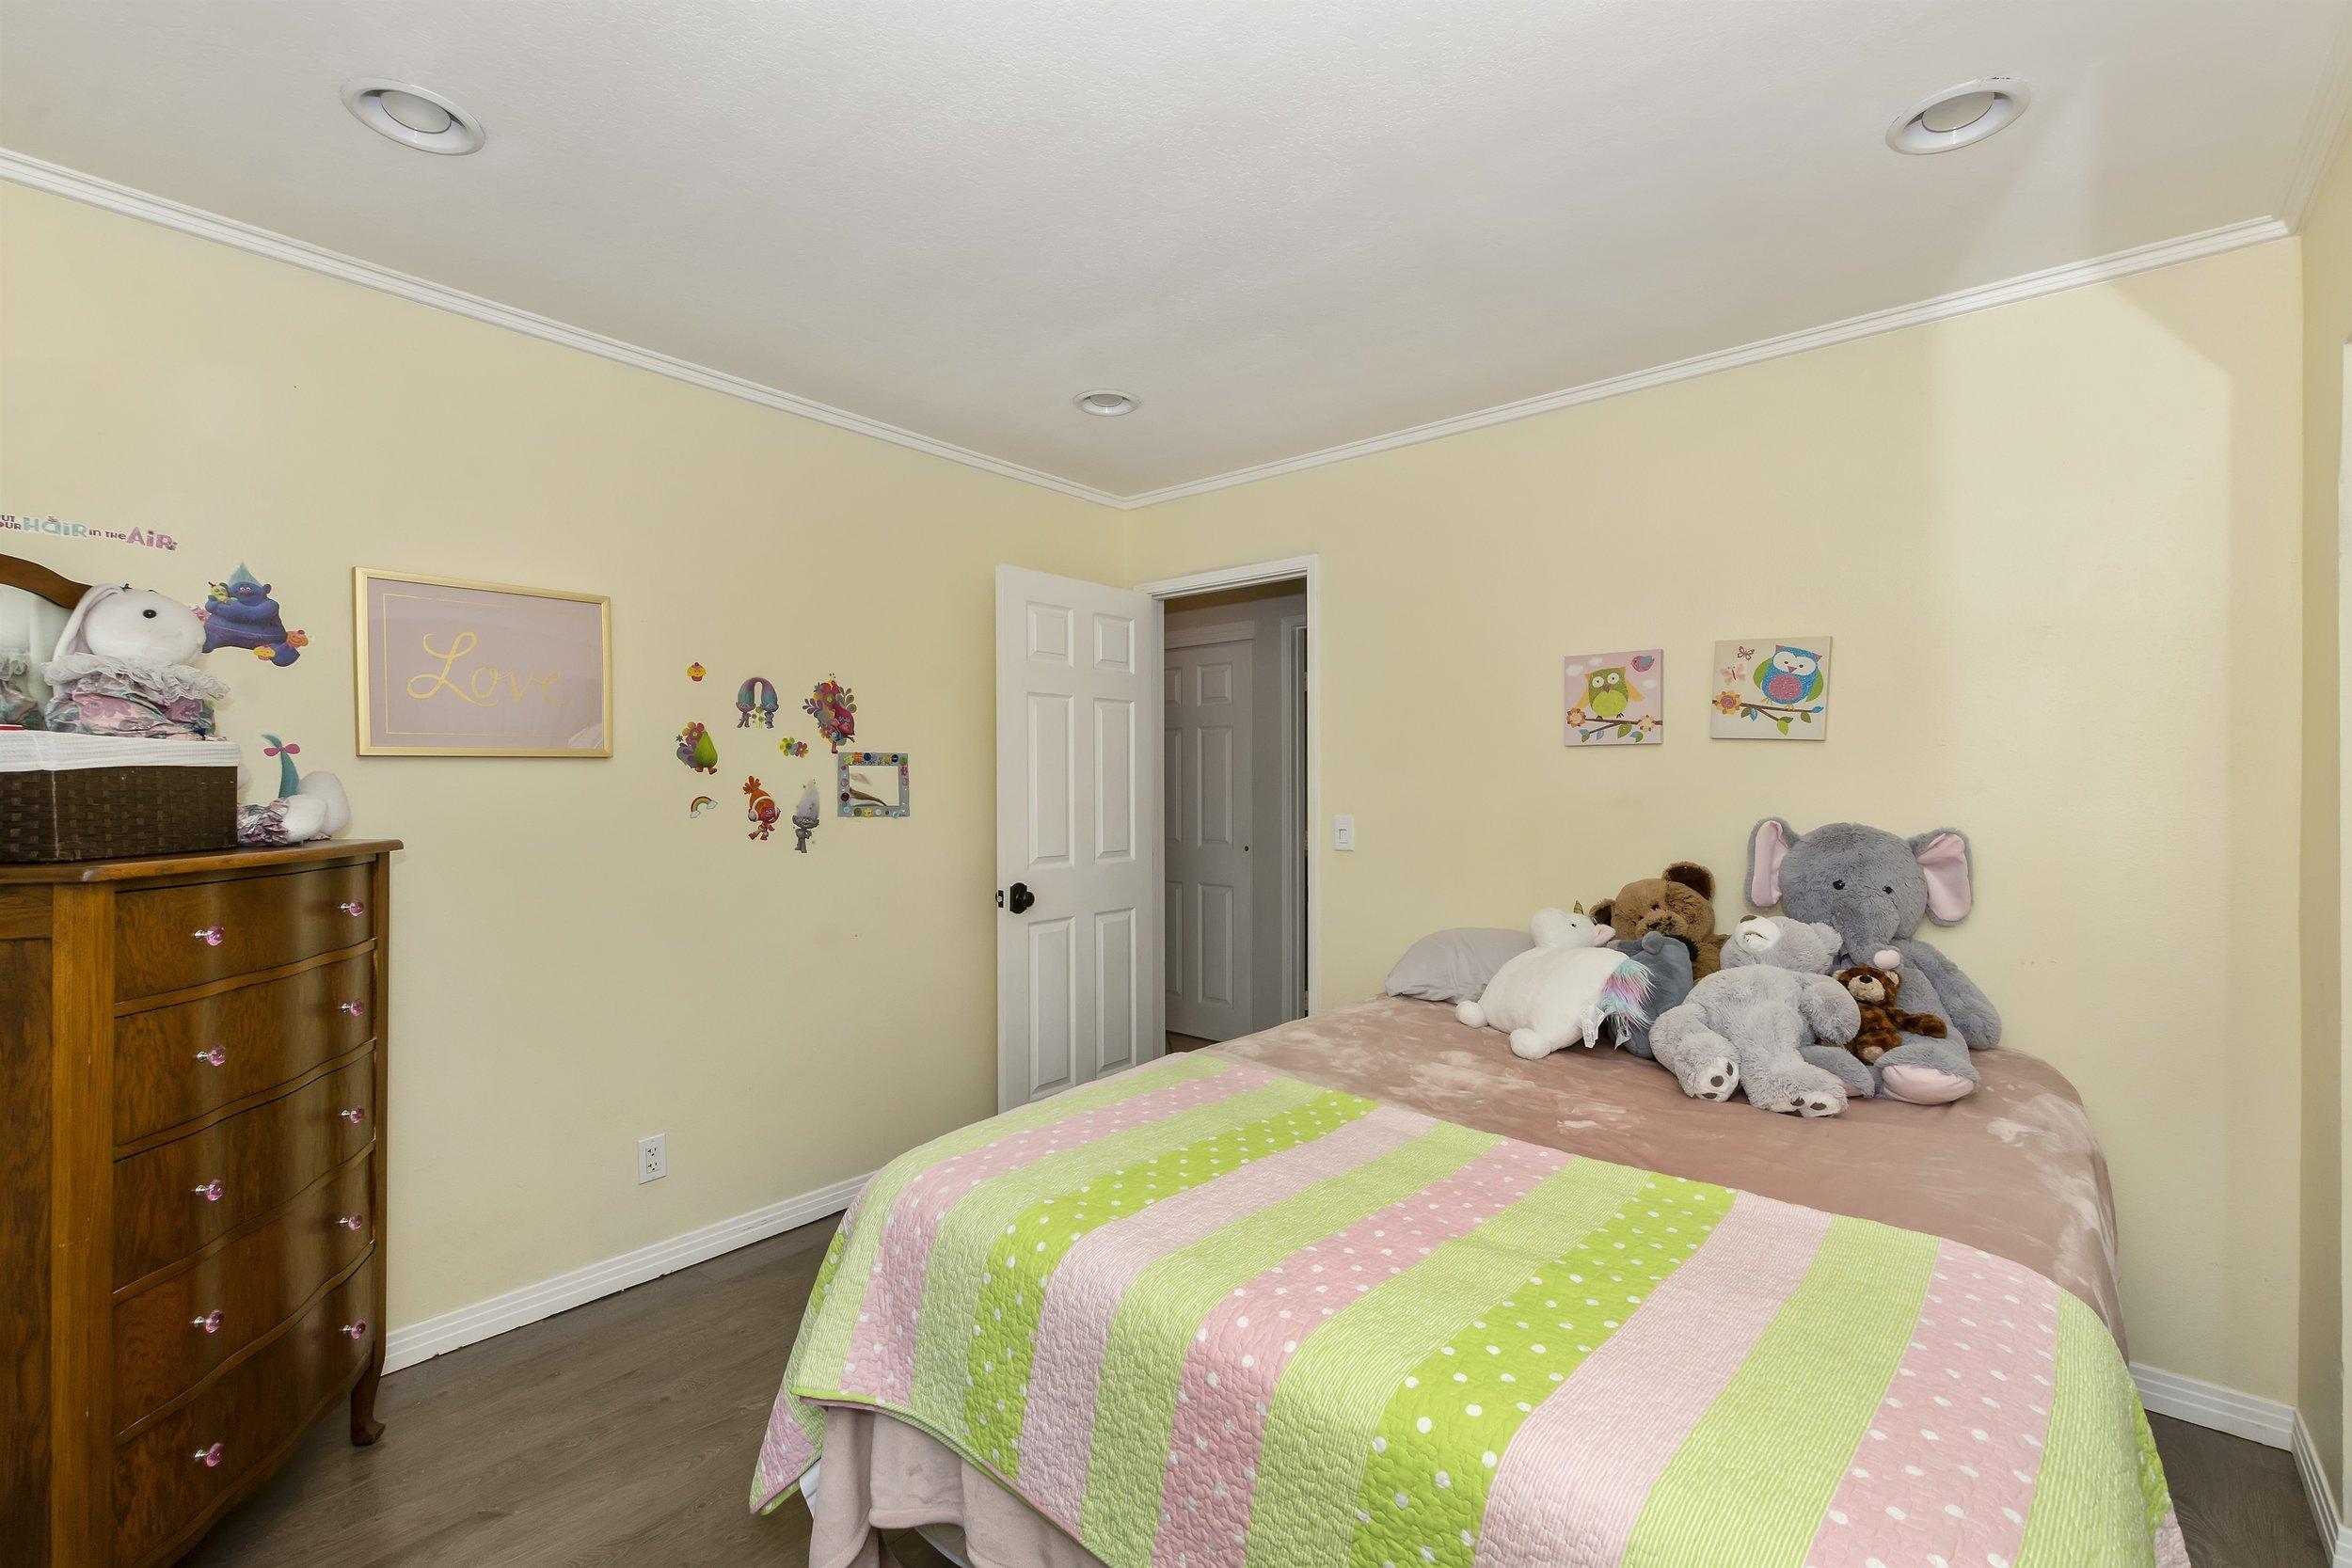 034_Bedroom.jpg